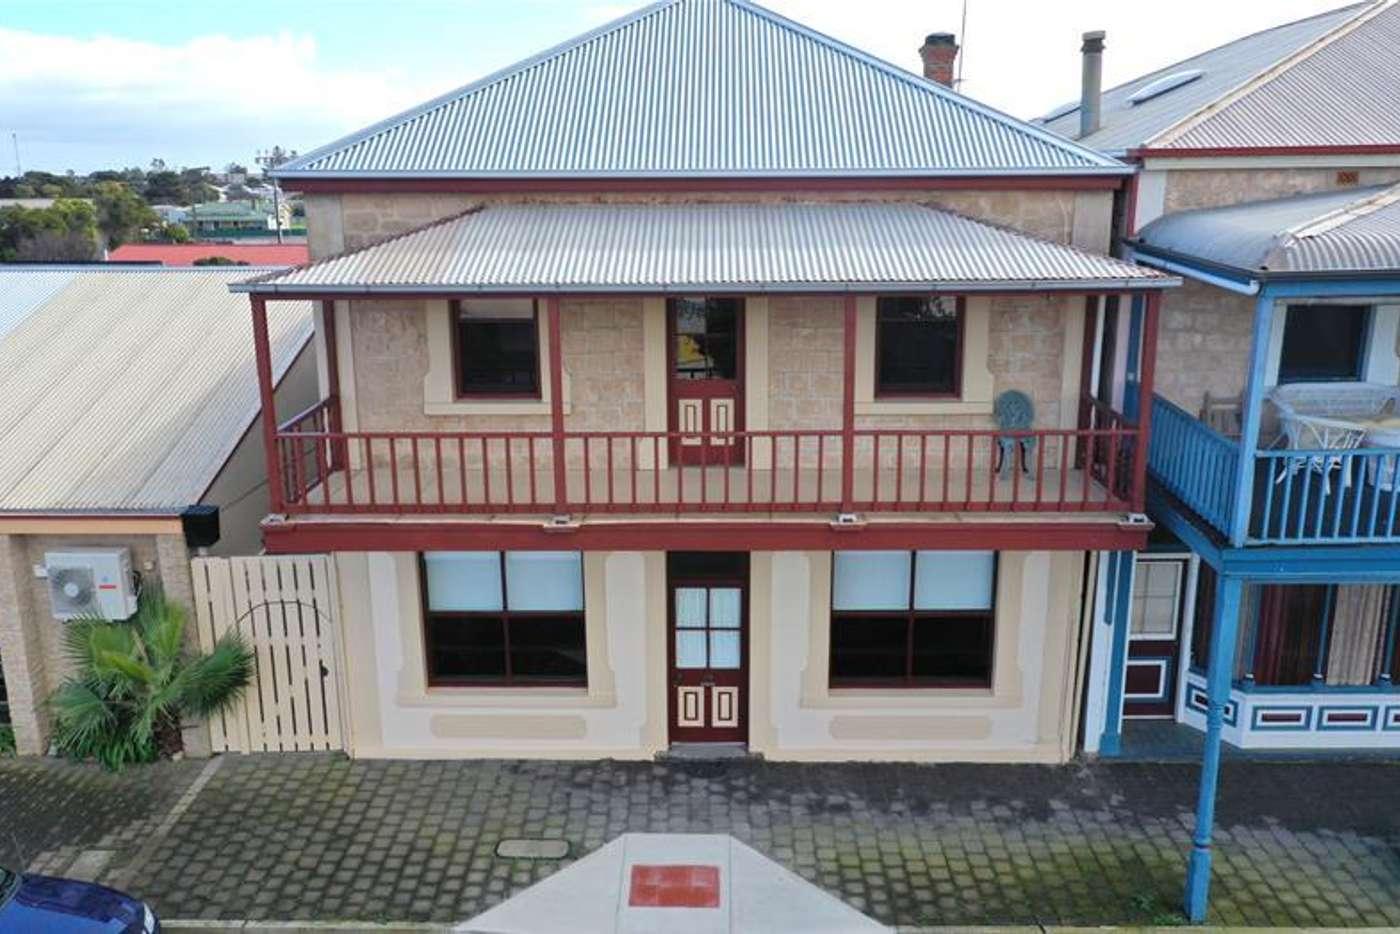 Main view of Homely house listing, 14 Edith Street, Edithburgh SA 5583